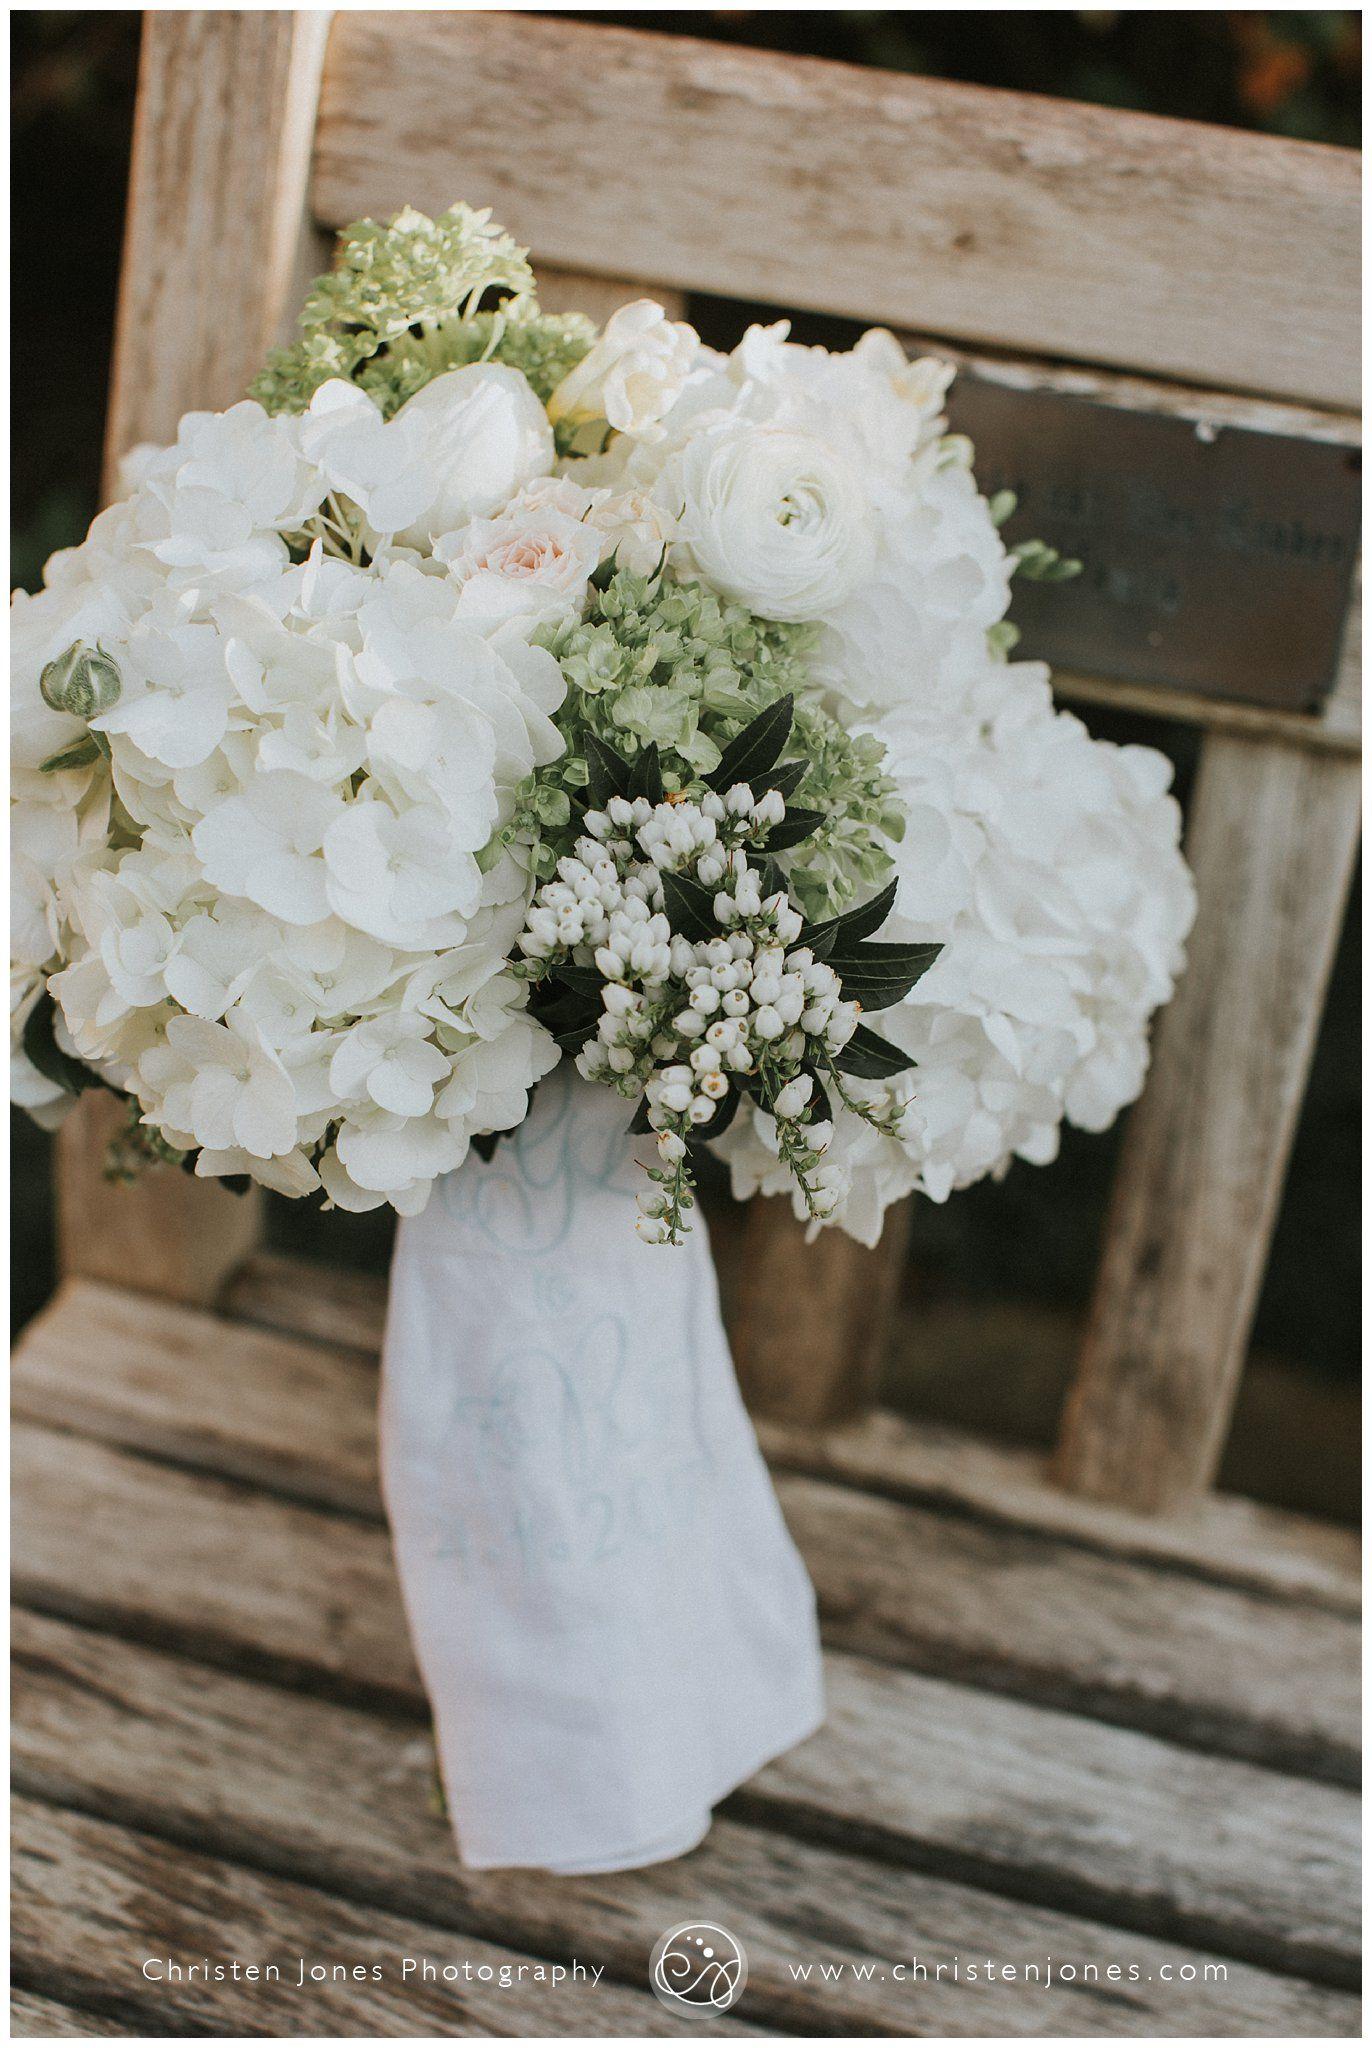 Kathleen Towner Flowers Memphis Wedding Vendors Bridal Bouquet White Hydrangeas Hankerchief And Green Rustic Christen